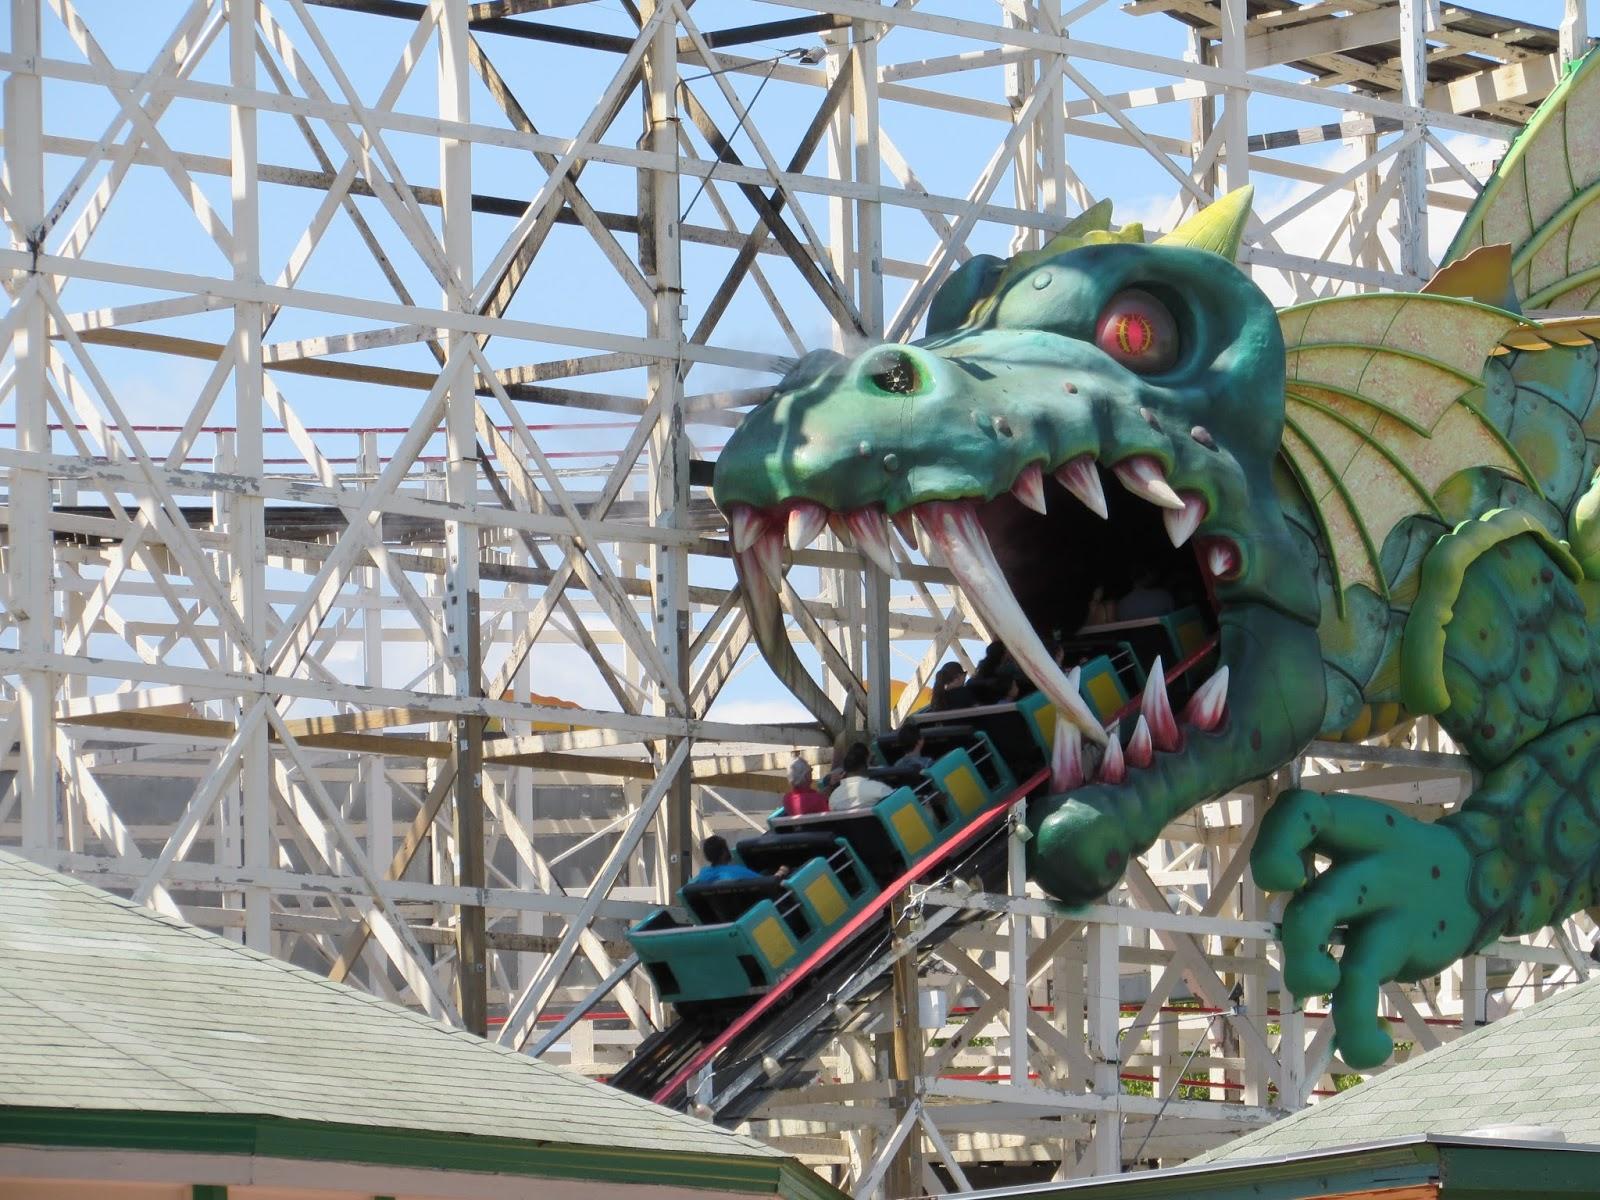 Rye Playland, Rye, New York, August 2015 | Coaster Talk No BS Zone